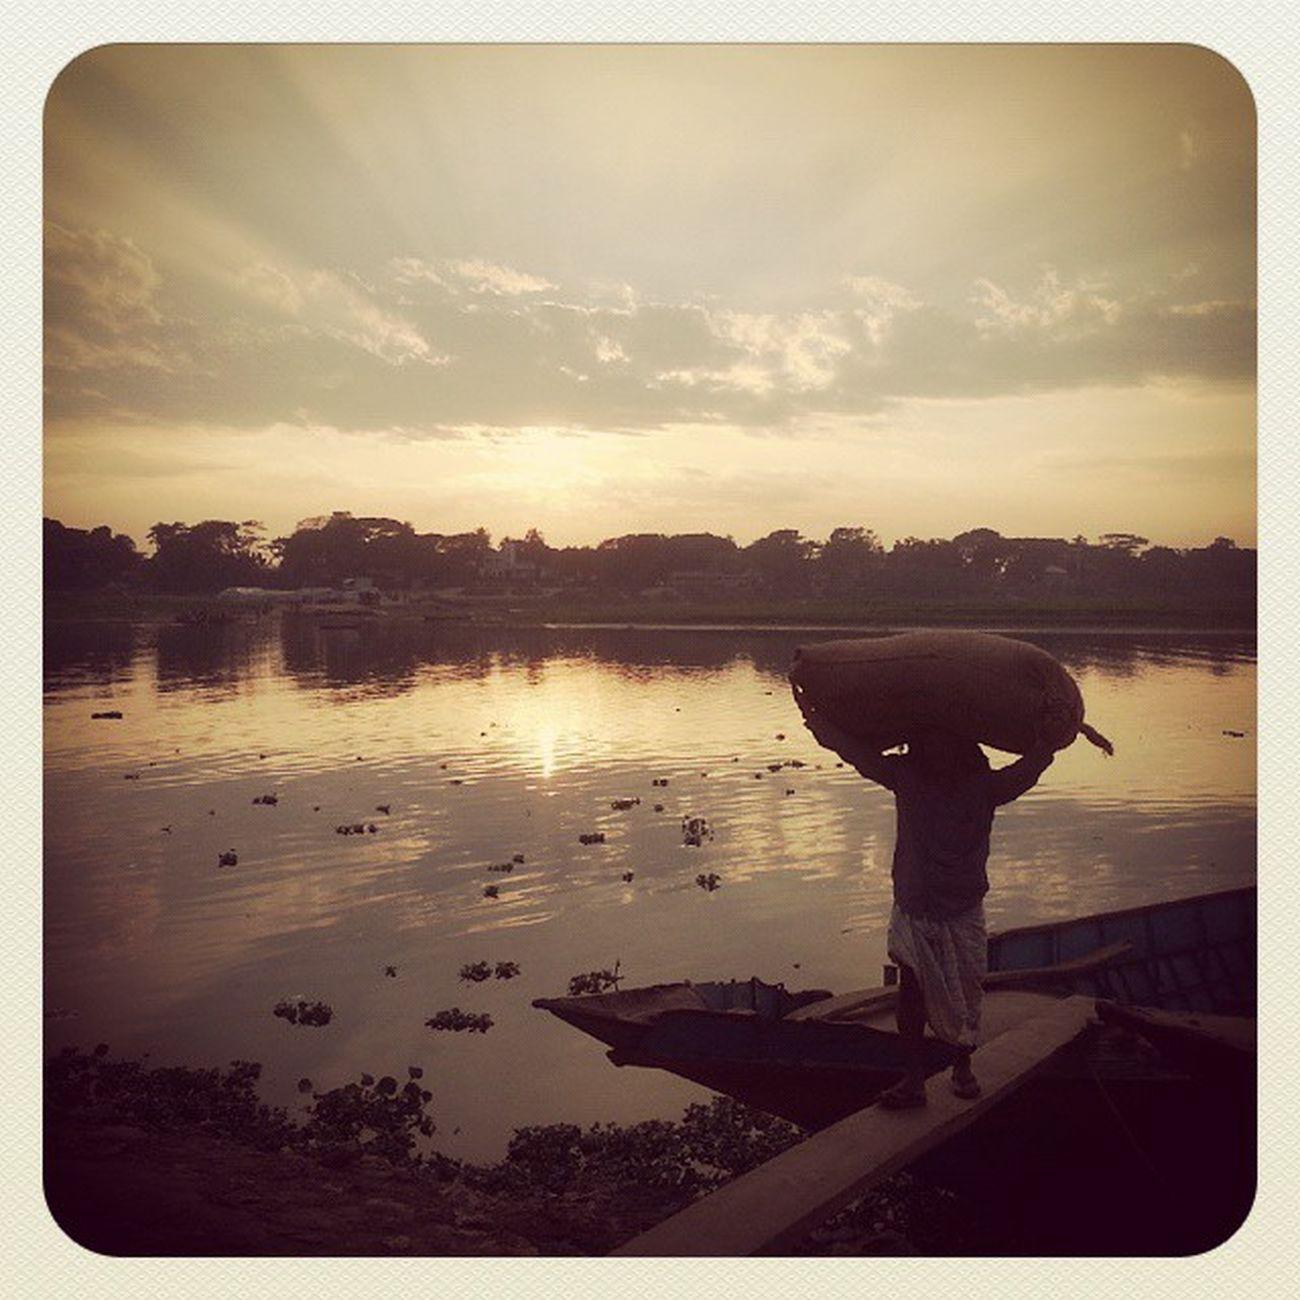 Boat Sunset River Daylaborer Labour Evening Calm